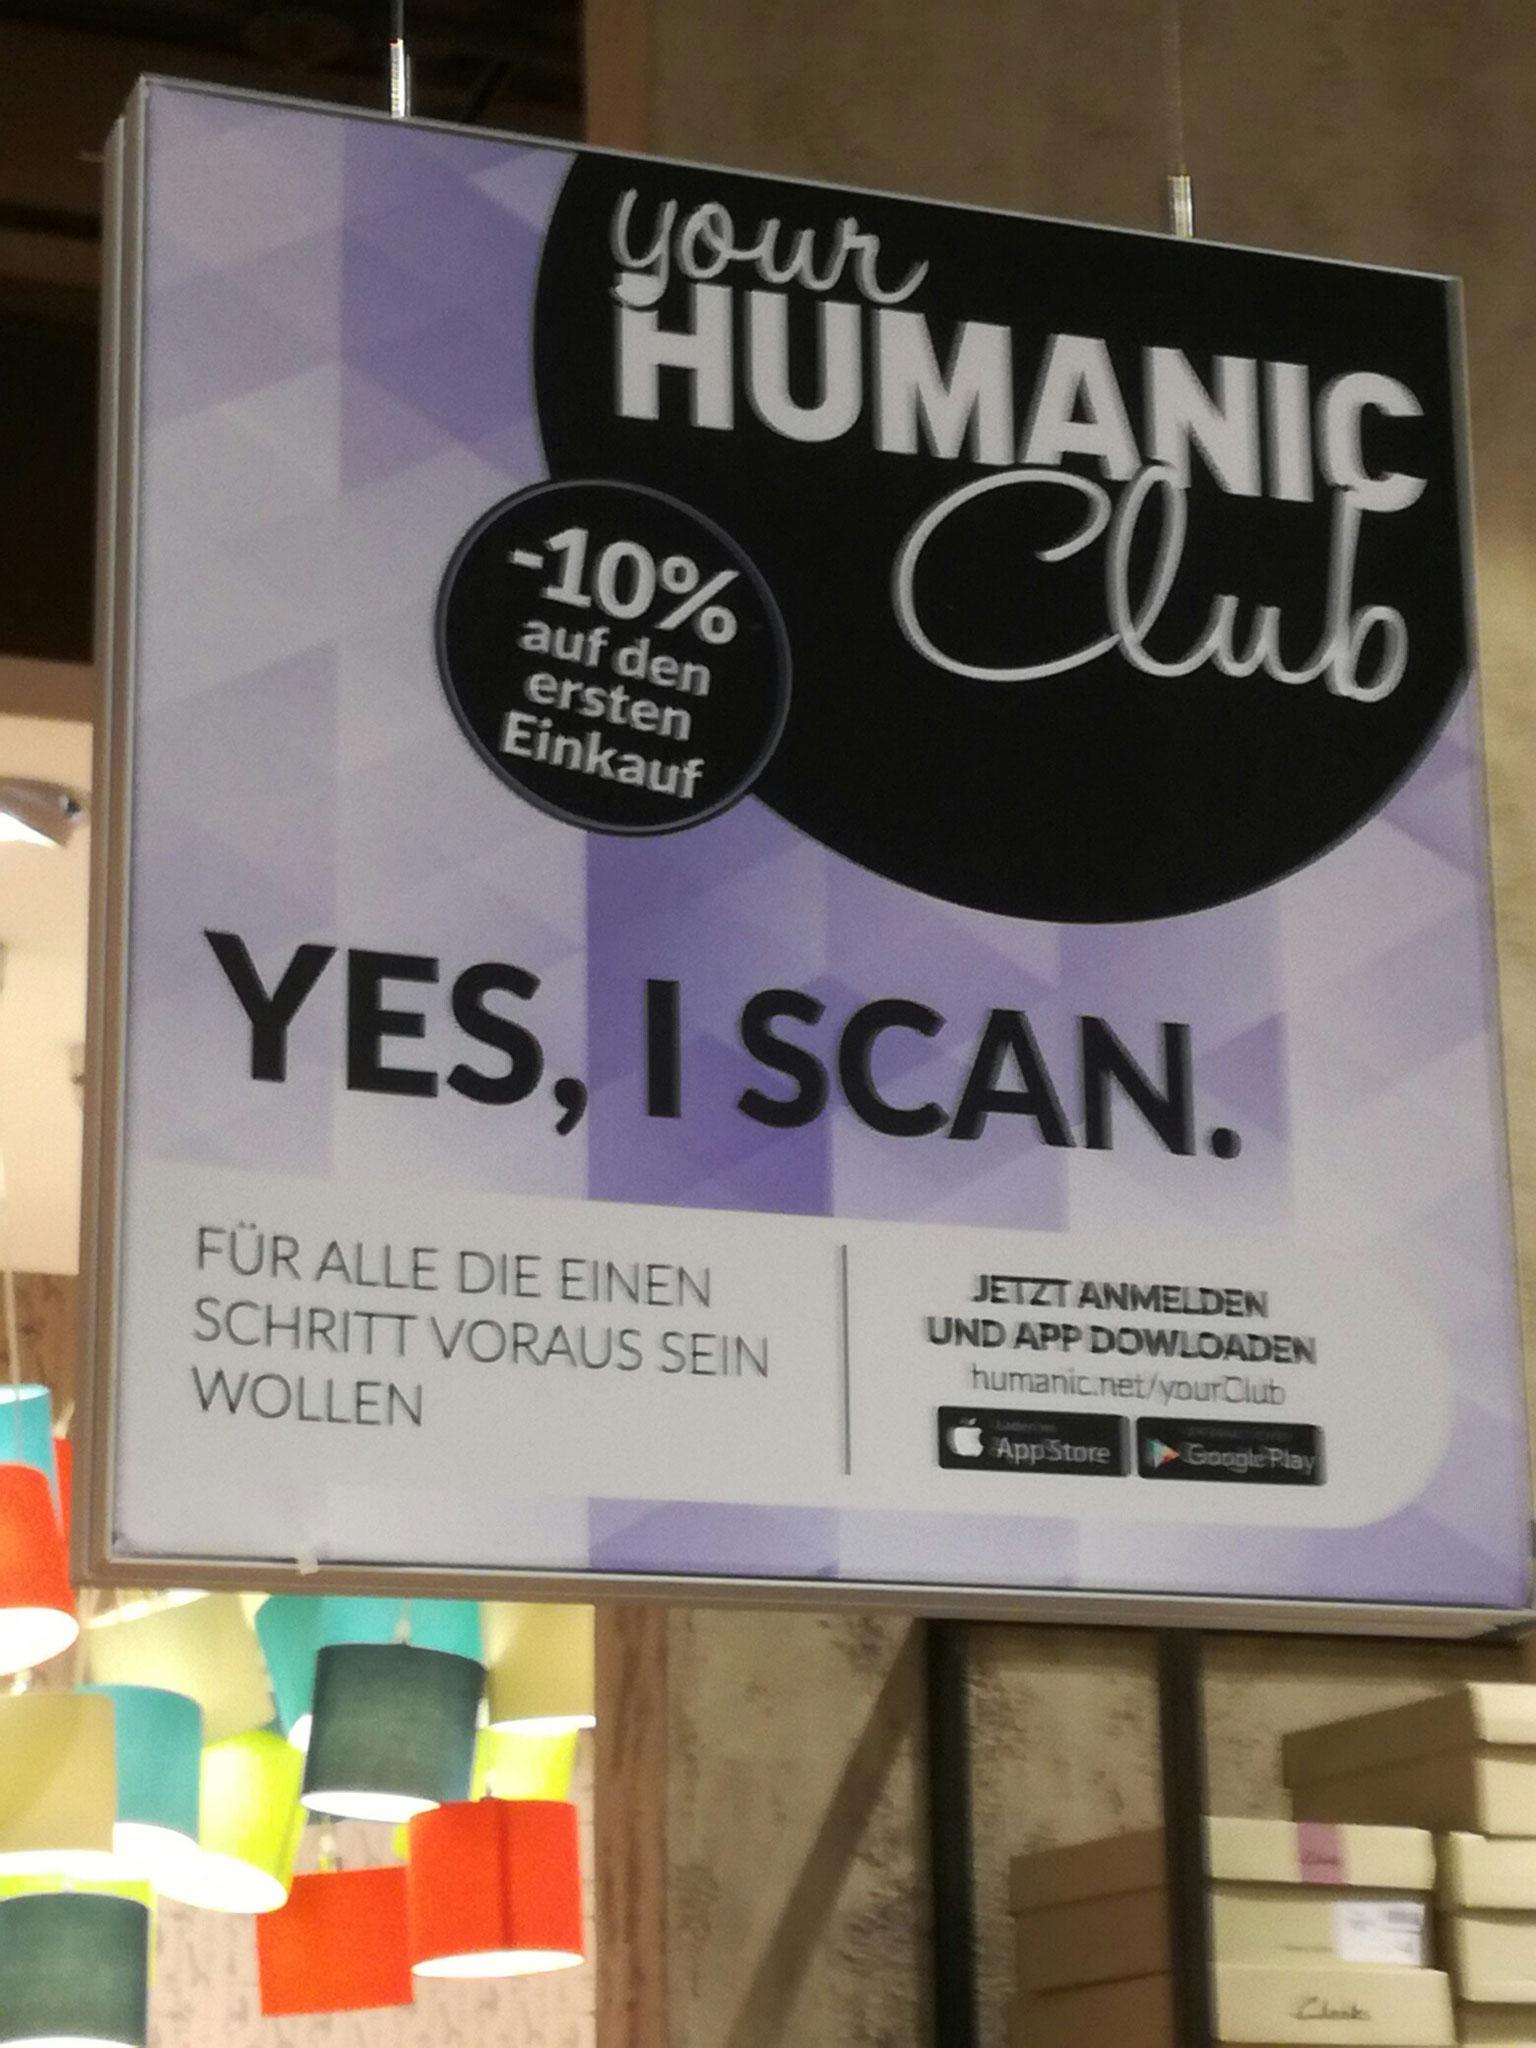 HUMANIC Club Kampagne